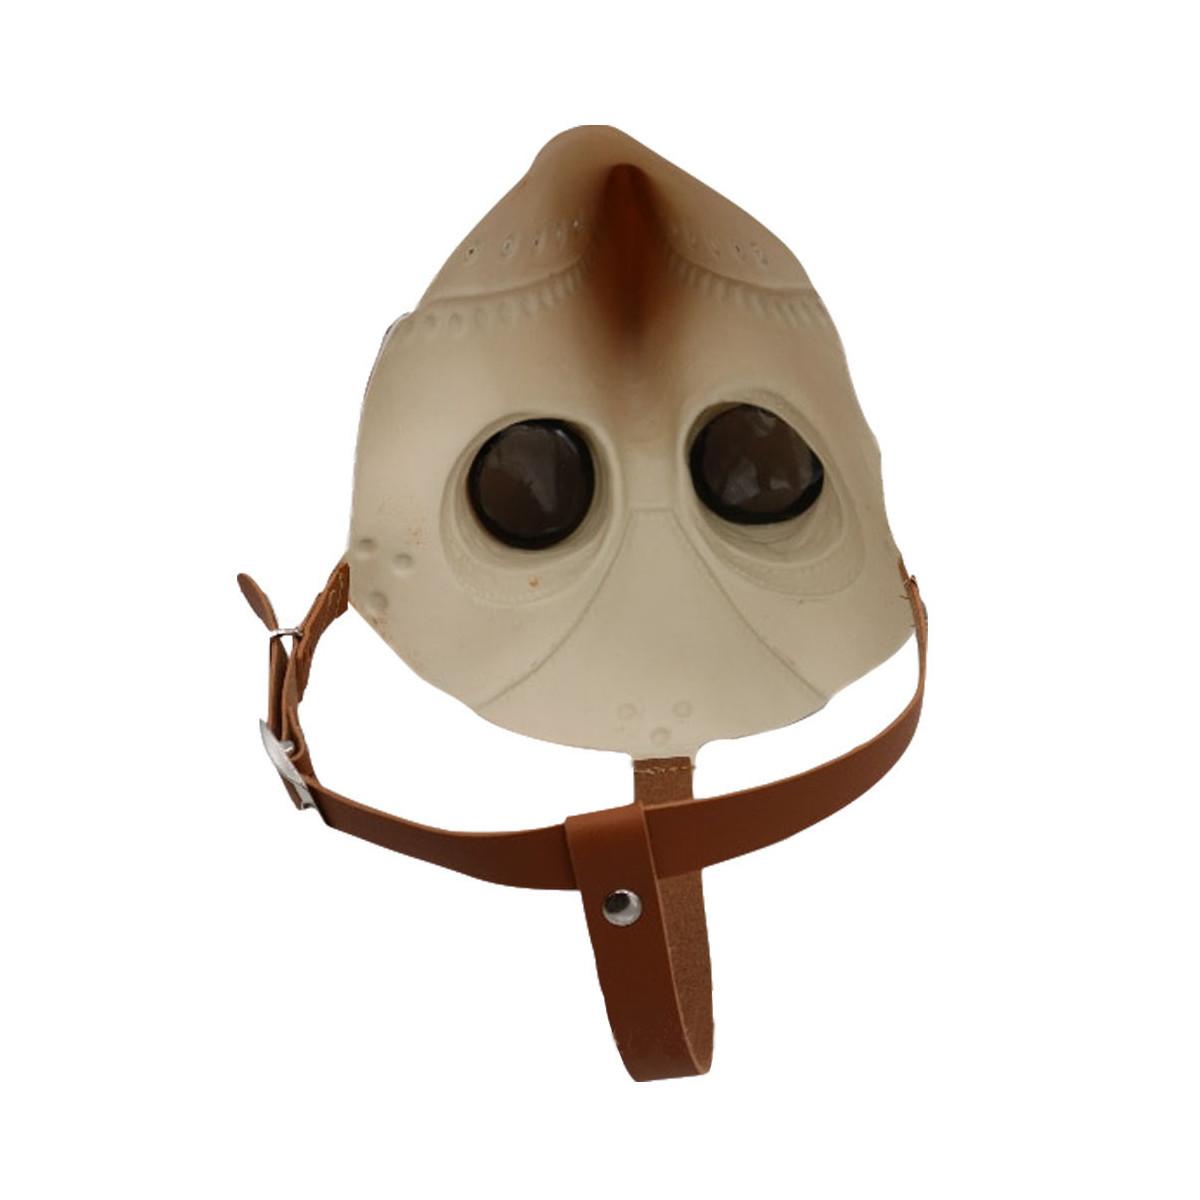 Хэллоуин косплей стимпанк чума доктор Маска птица клюв реквизит ретр готика Маскаs - фото 404a06c3-5f8d-4c8e-92b5-3b225da0ea72.jpg